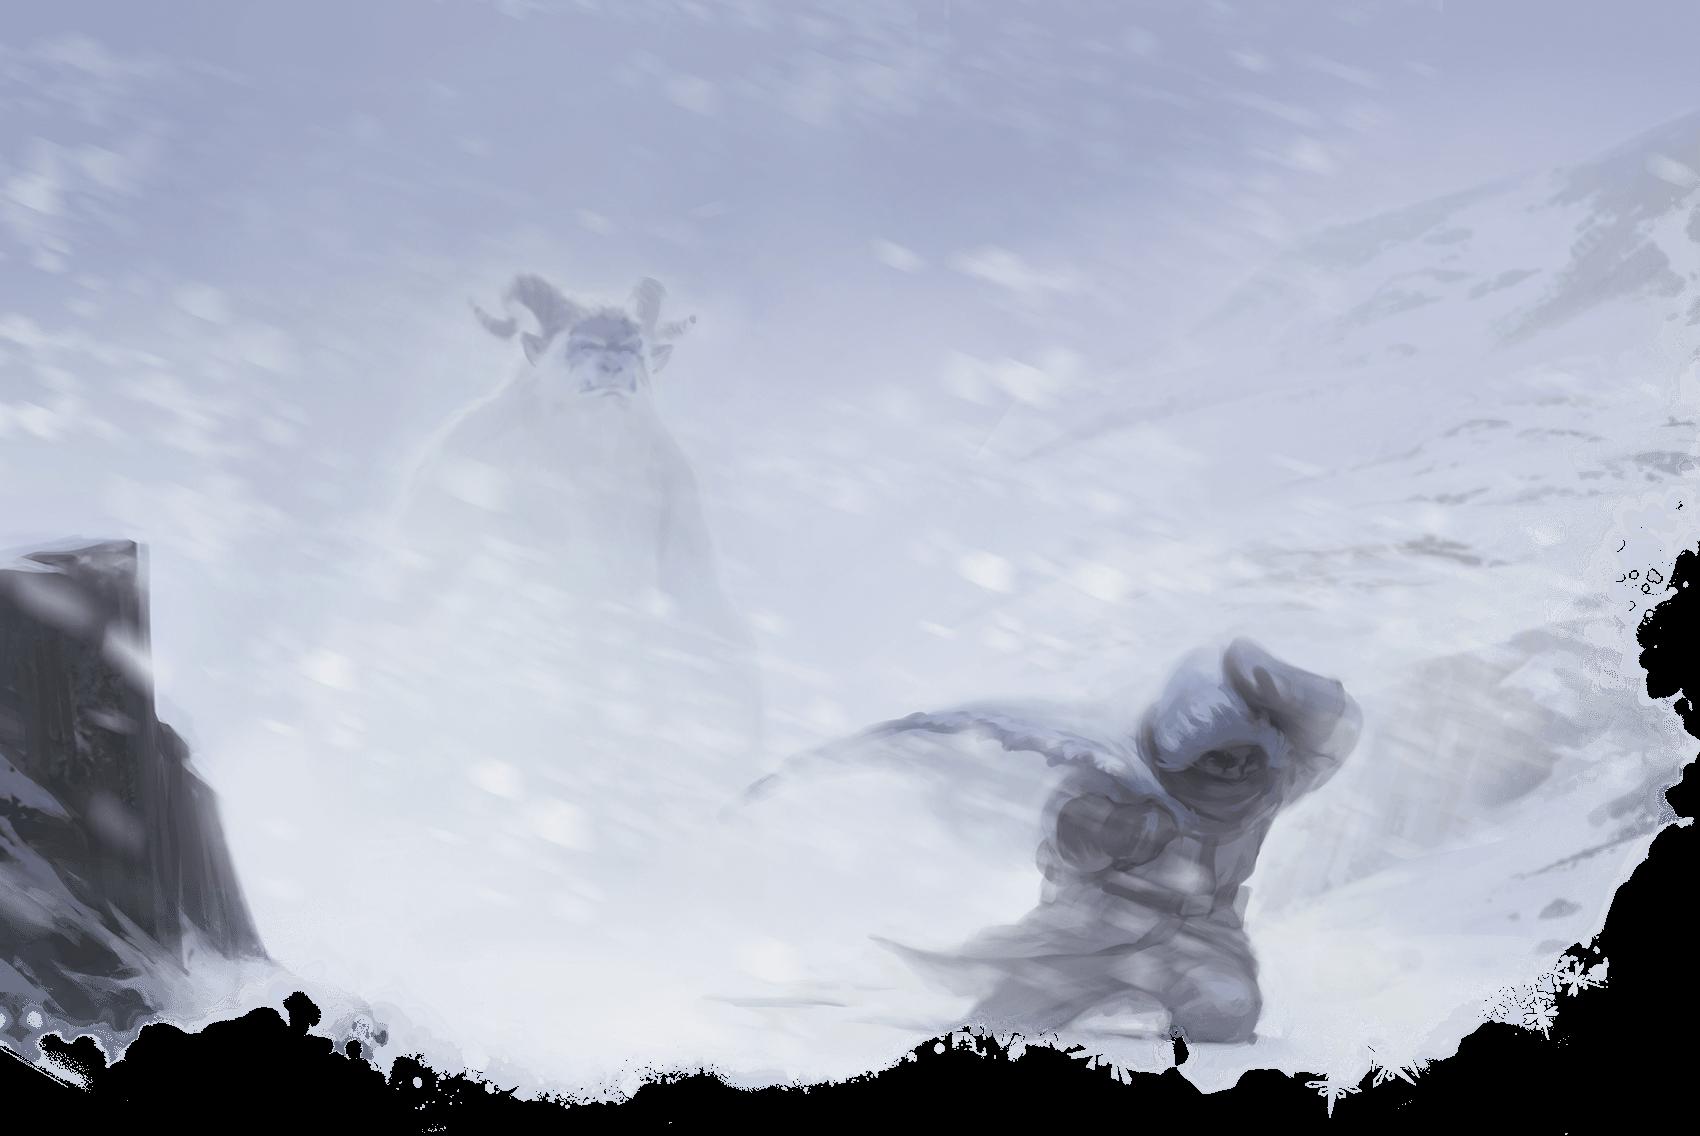 A lone figure walking in a horrible blizzard.